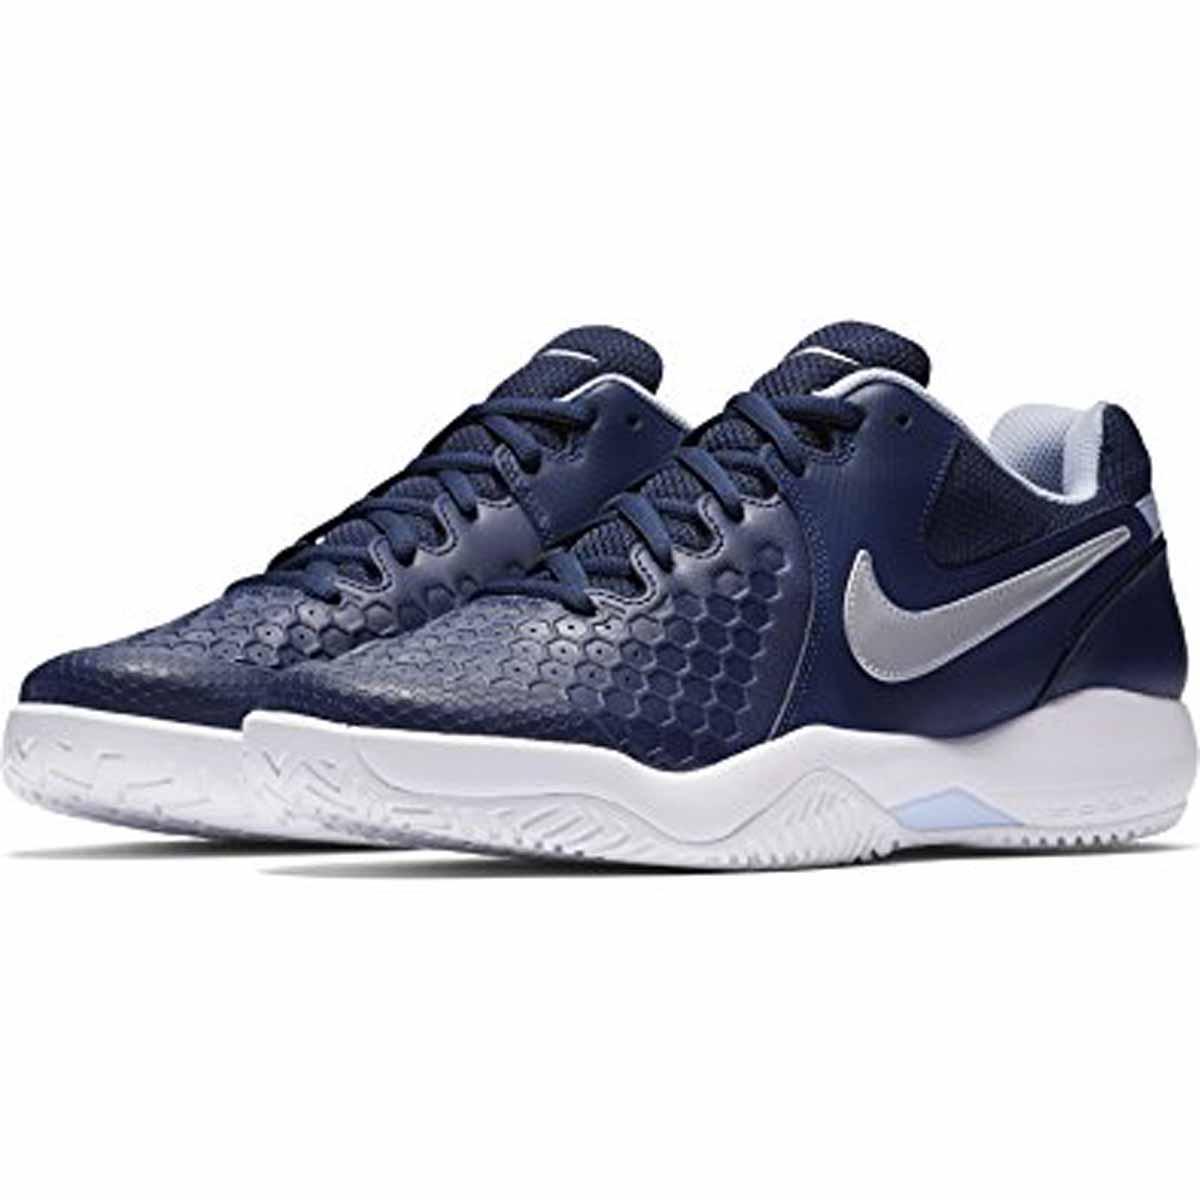 best website e72f8 c9367 Nike Air Zoom Resistance Tennis Shoes